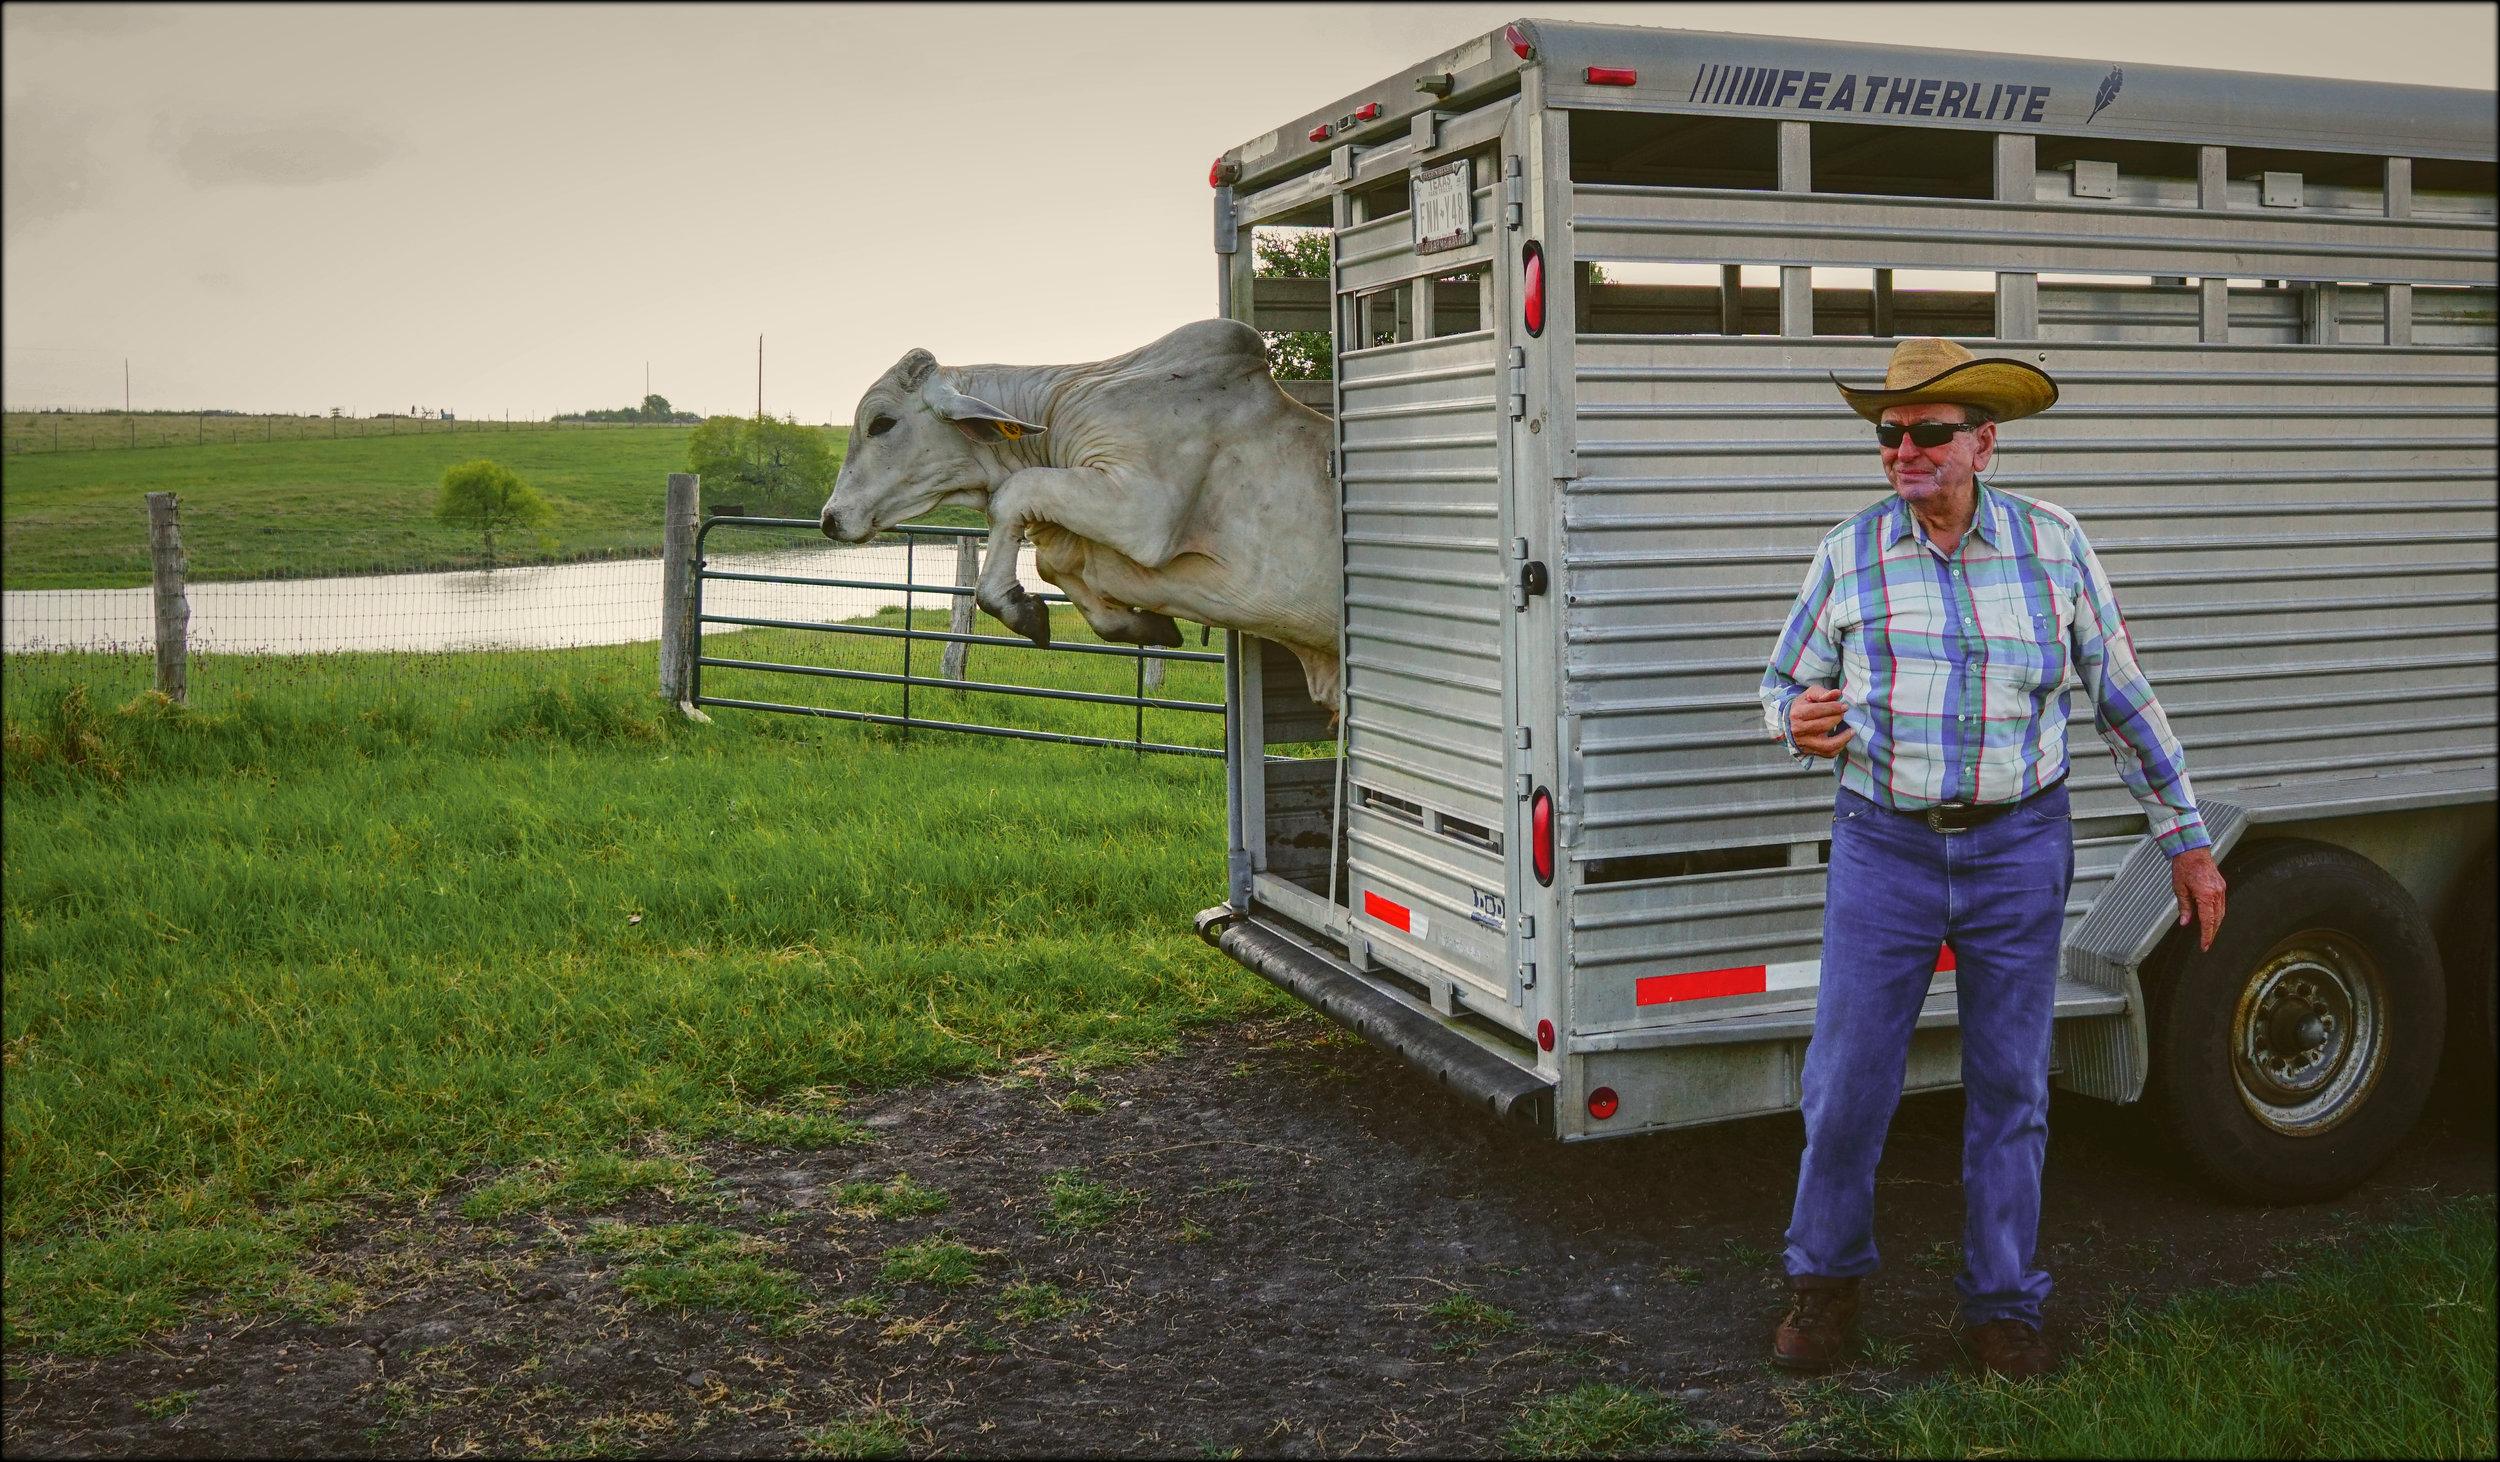 6th Annual Farmer as Artist Show - Photo by Christian Sacra